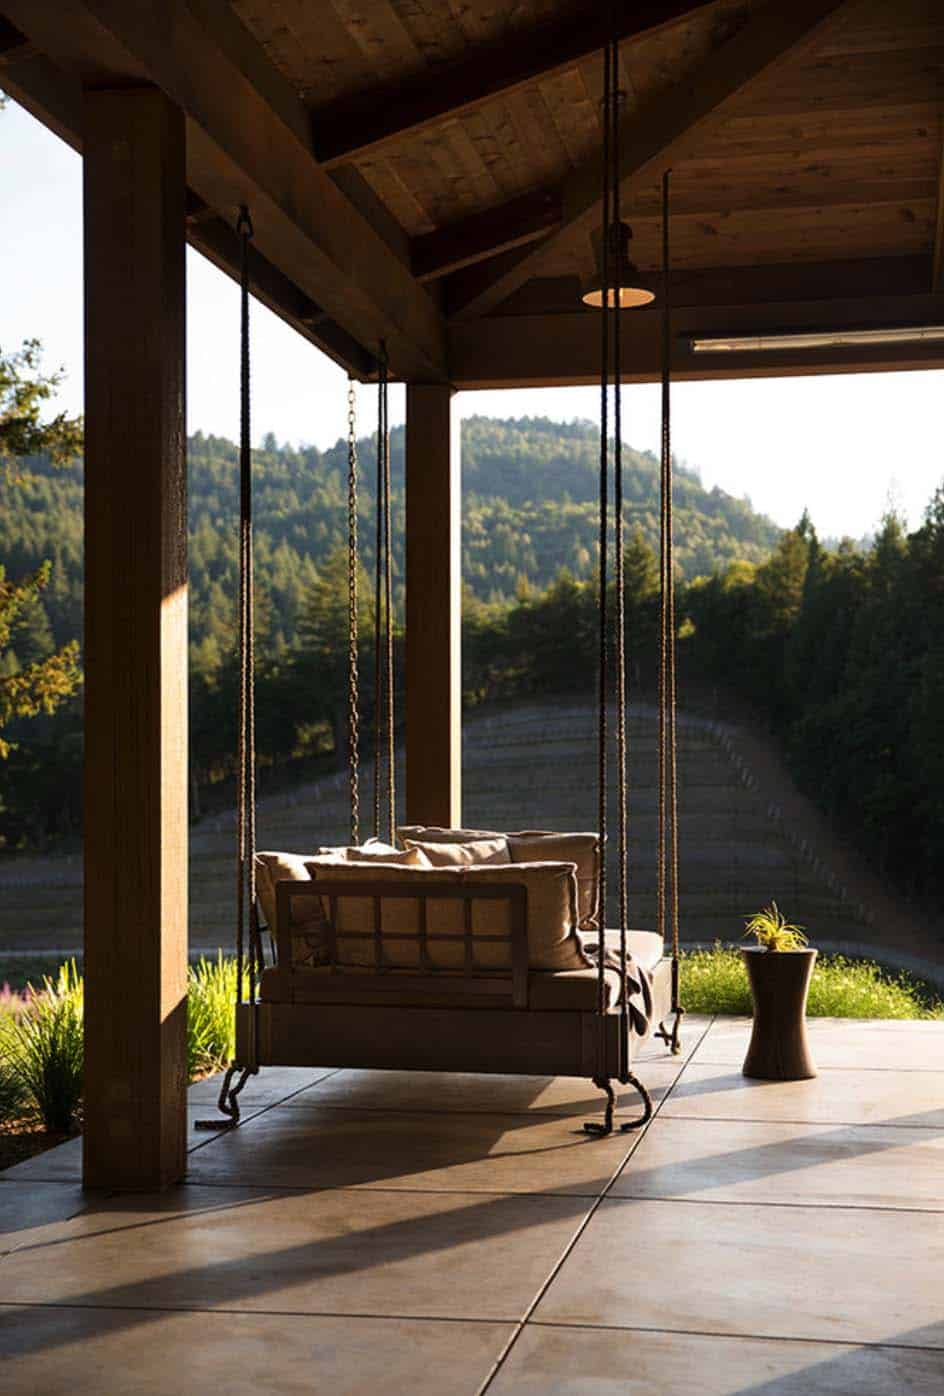 Maison de style ferme-Jennifer Robin Interiors-15-1 Kindesign